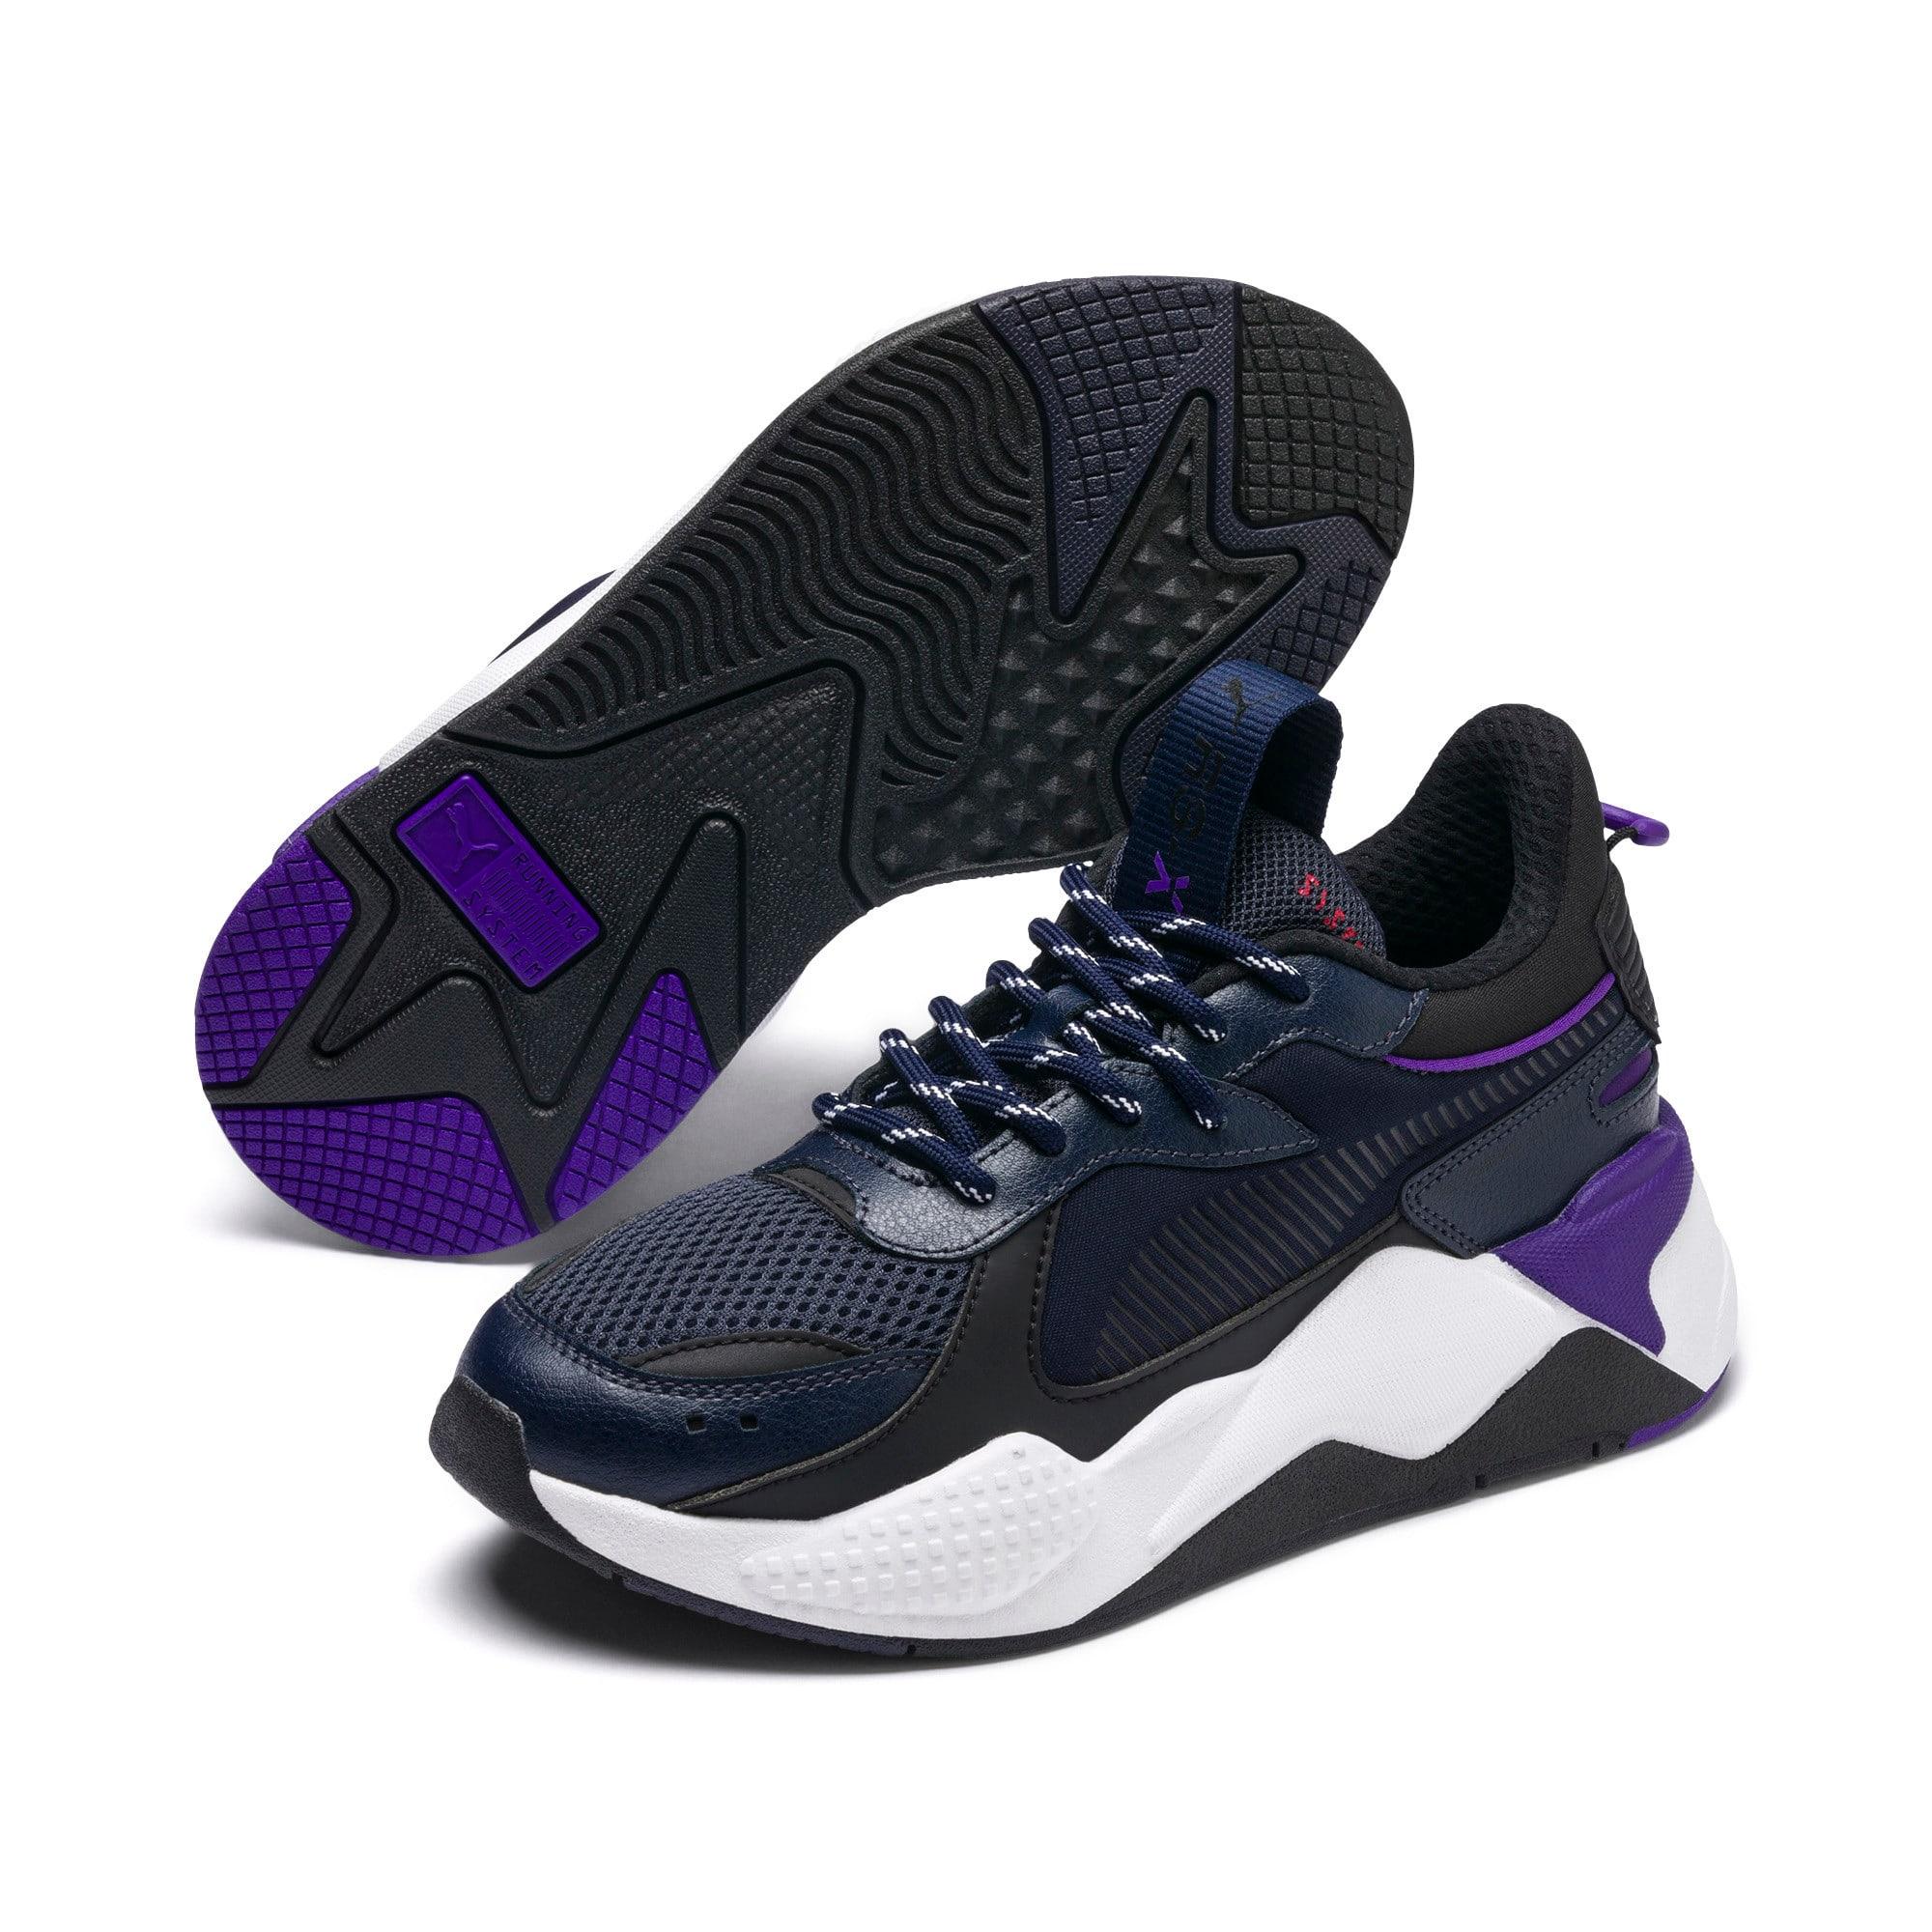 Thumbnail 2 of RS-X Tracks Sneakers JR, Puma New Navy-Puma Black, medium